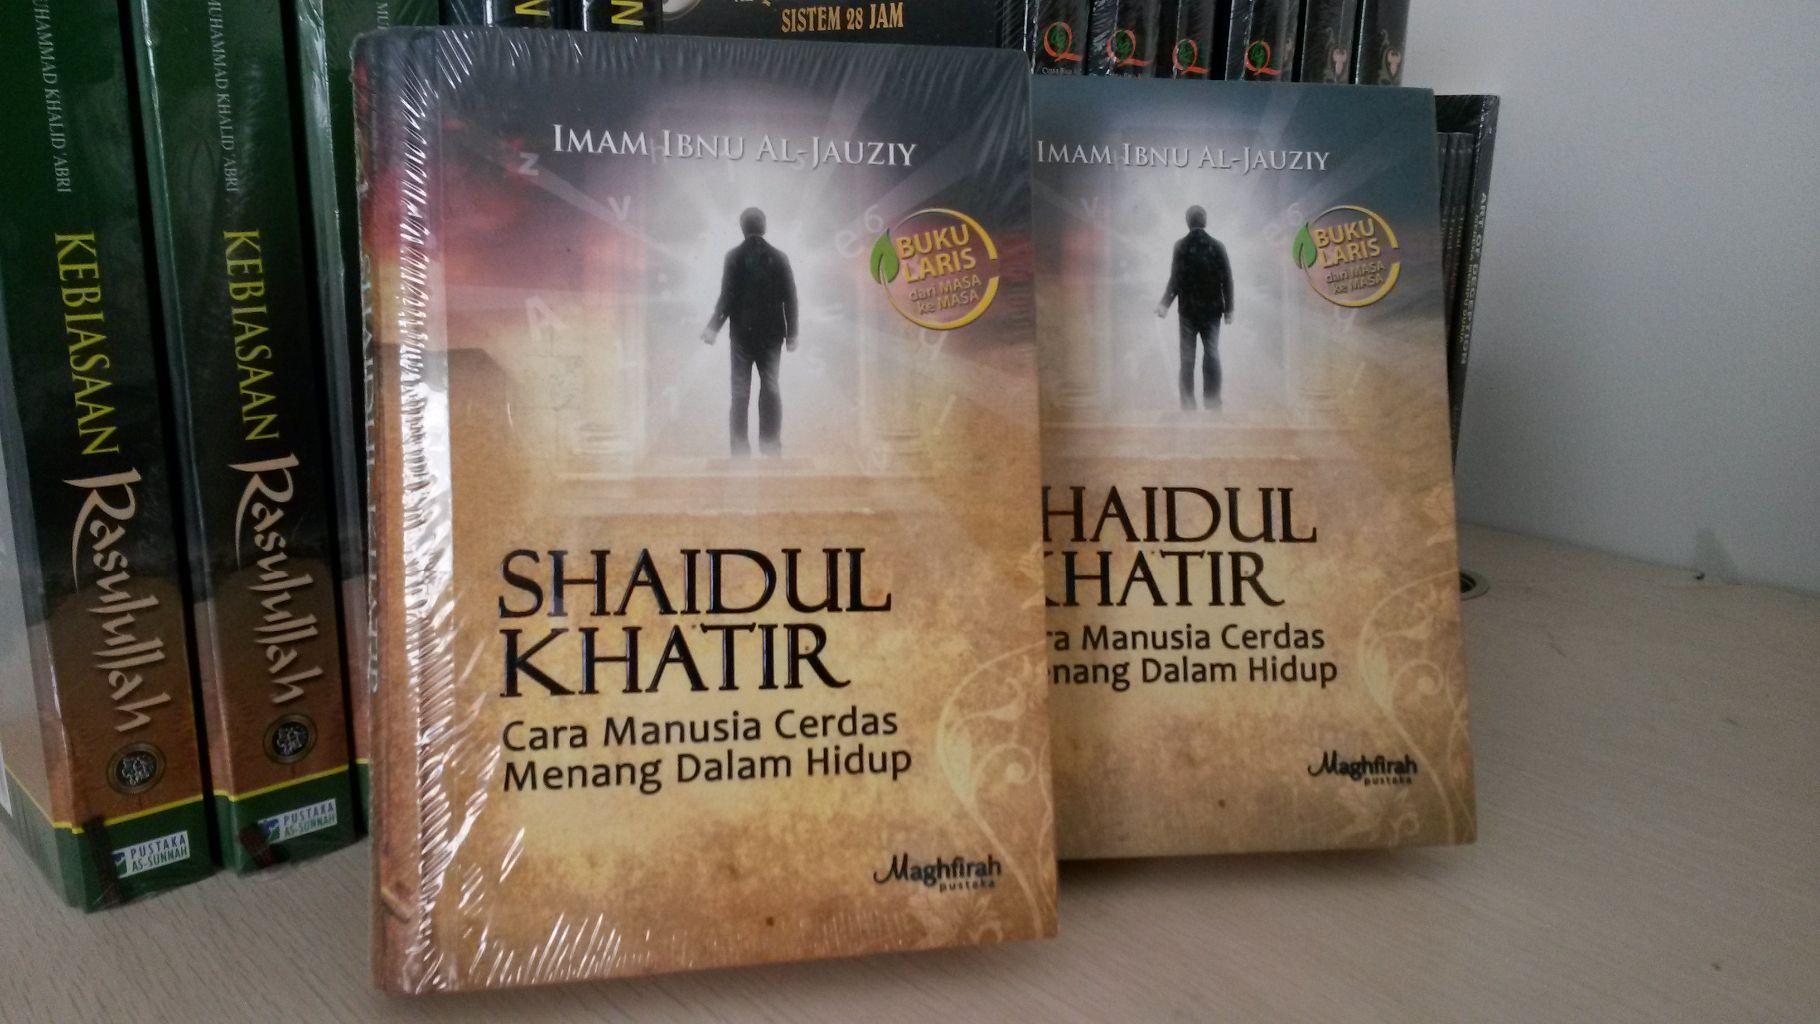 shaidul